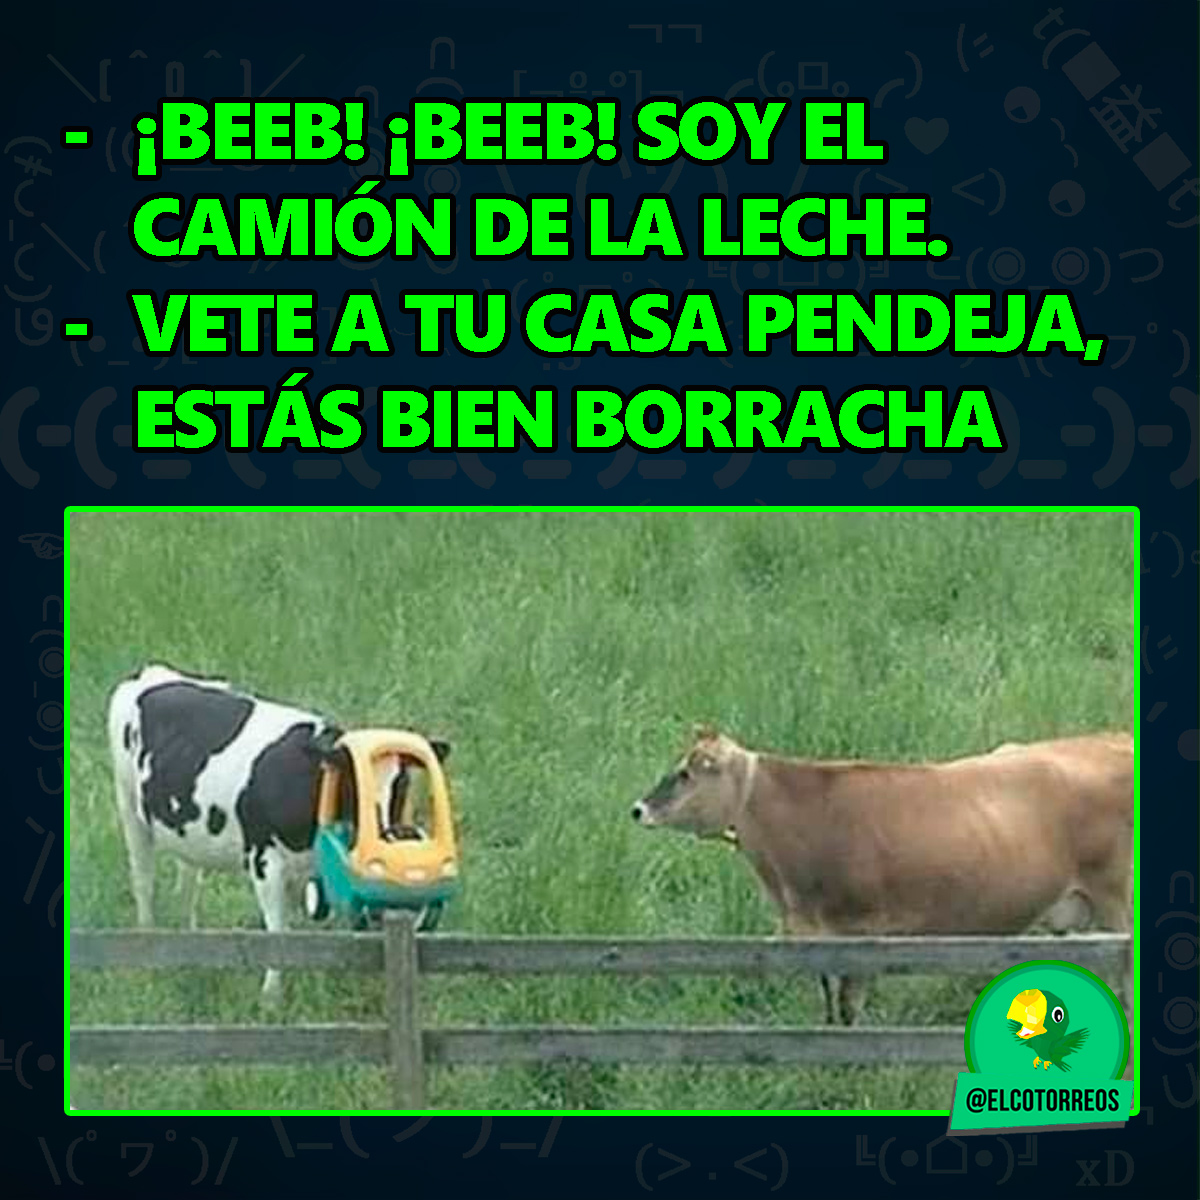 Beeb! La vaca lola XD   Sígueme  para mucho mas: @elcotorreos  #memesespañol #momazos #momazo #memazos #momo #momos #memes #meme #humor #sdlg #momossad #momos_4k #repoio #cmamo #cmamut #chistes #gracioso #funnymemes #memes#lmao #memesdailypic.twitter.com/wHkEMGezw4